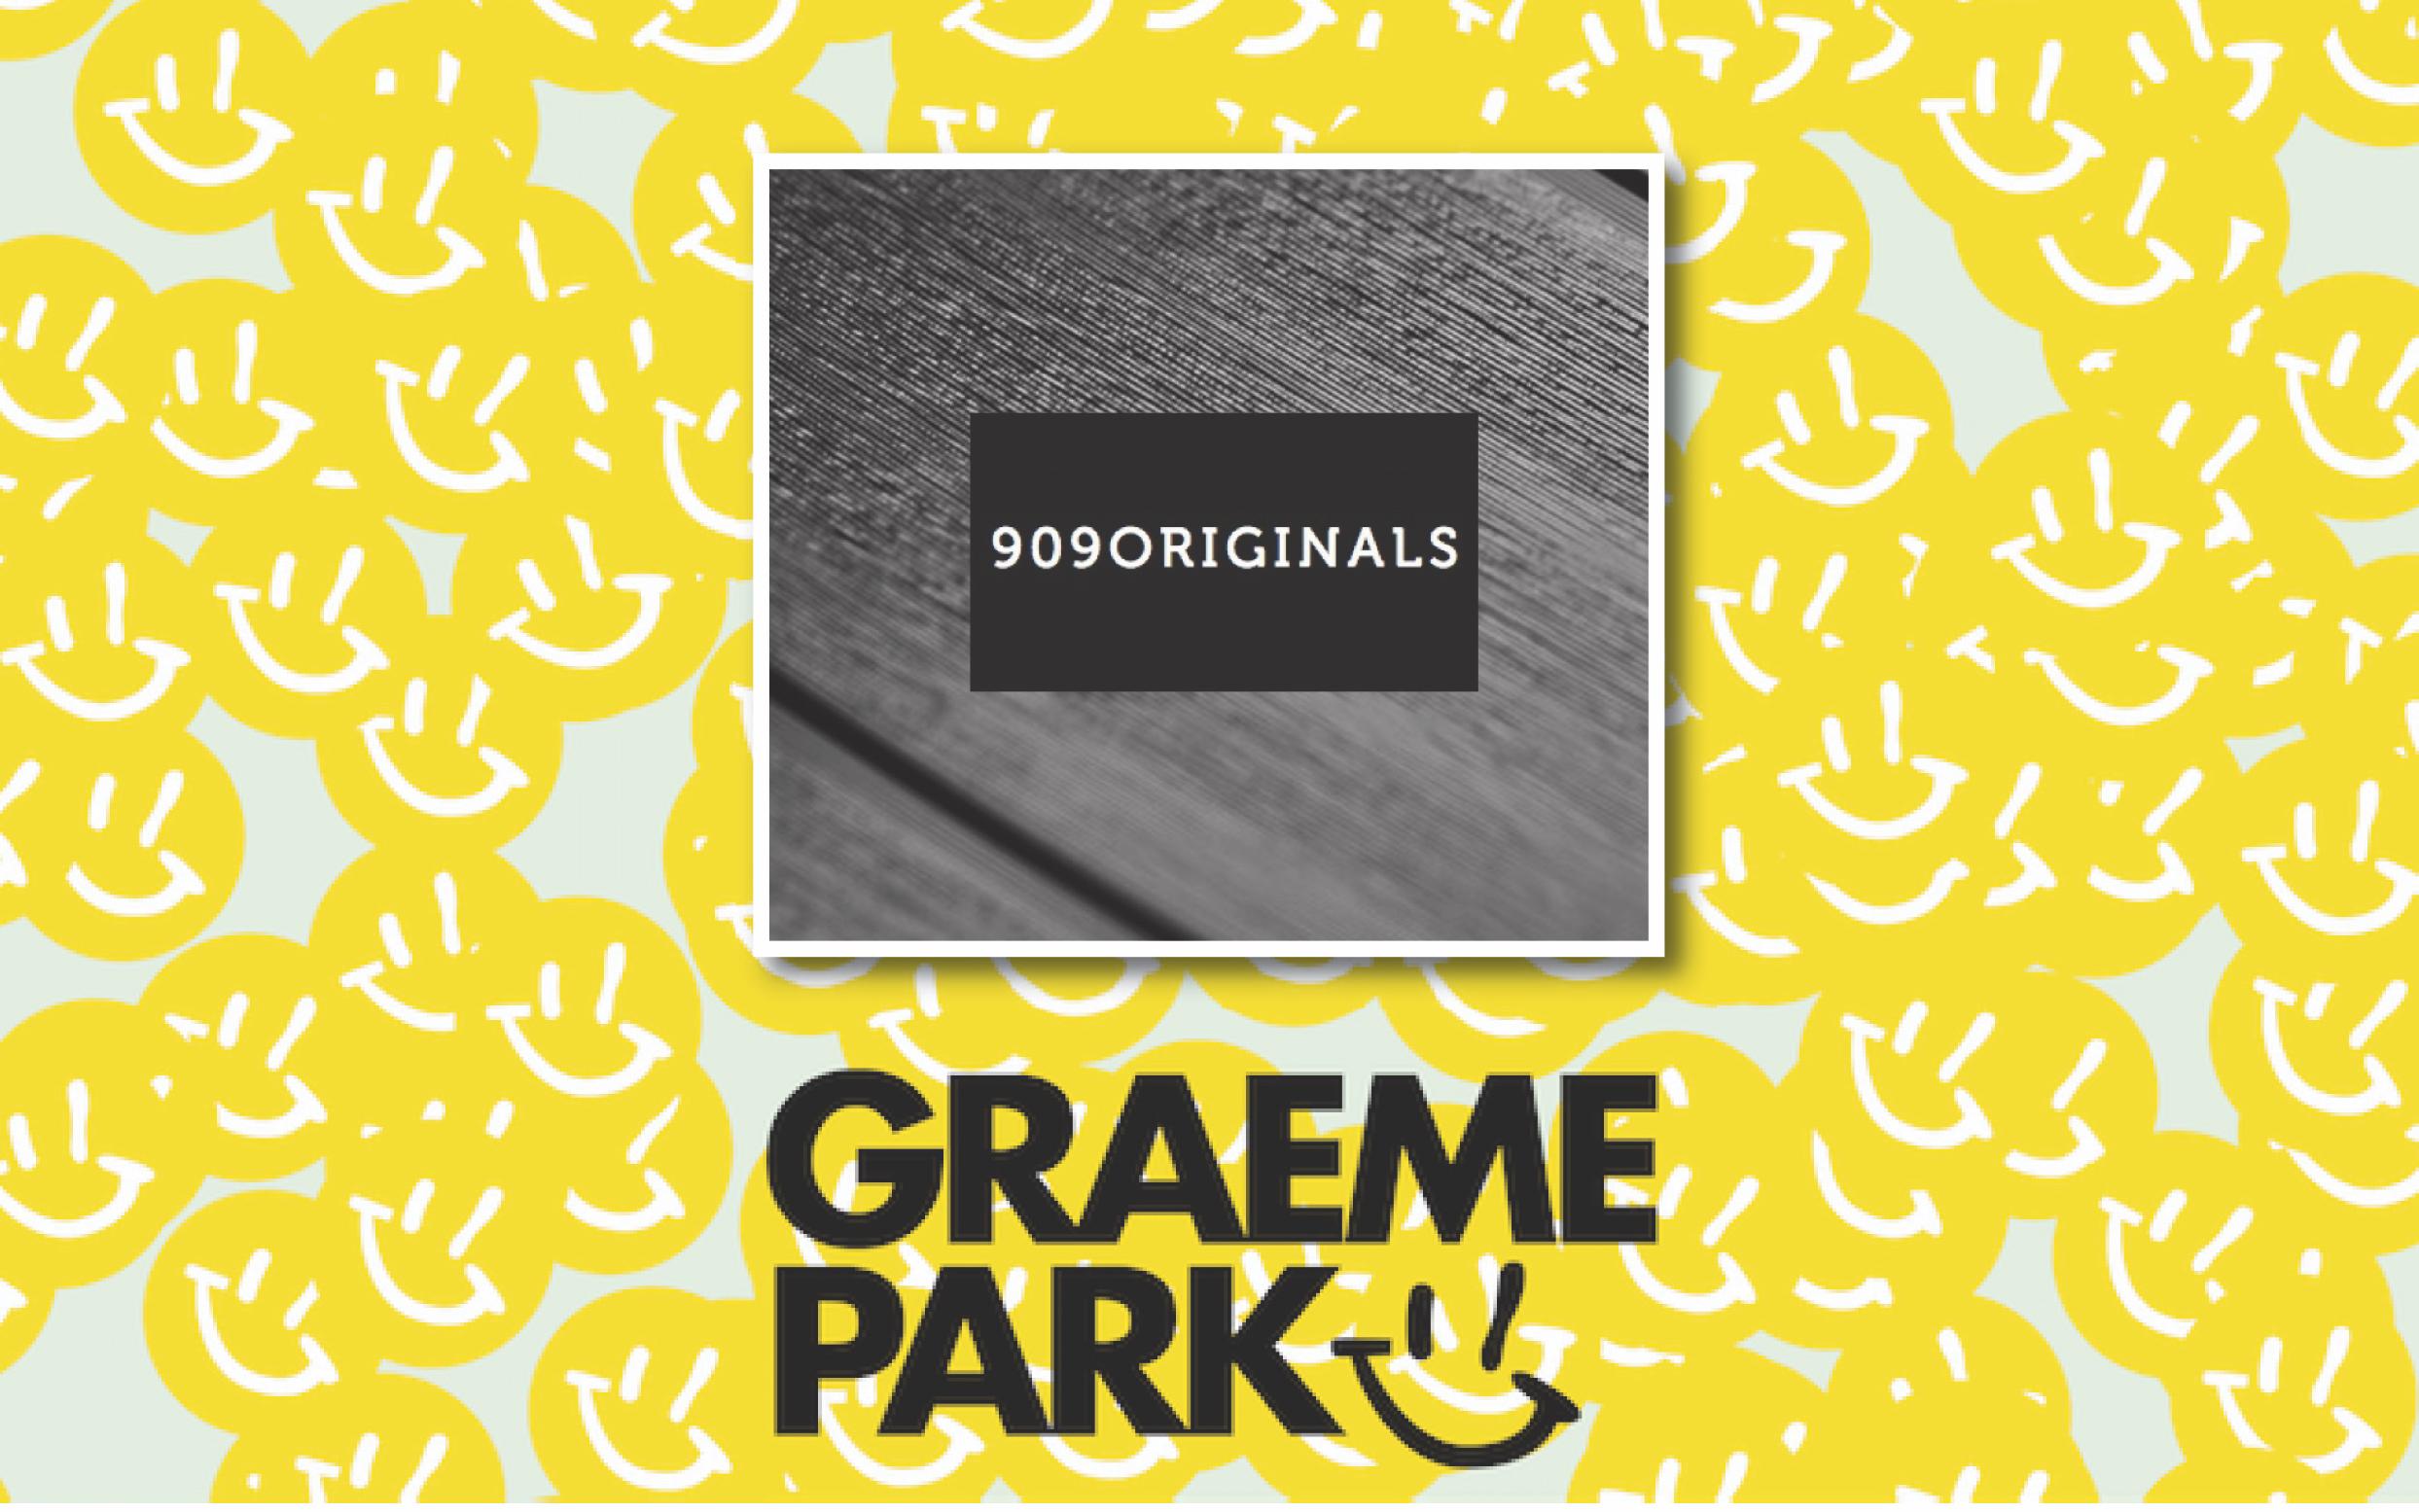 The Graeme Park Radio Show